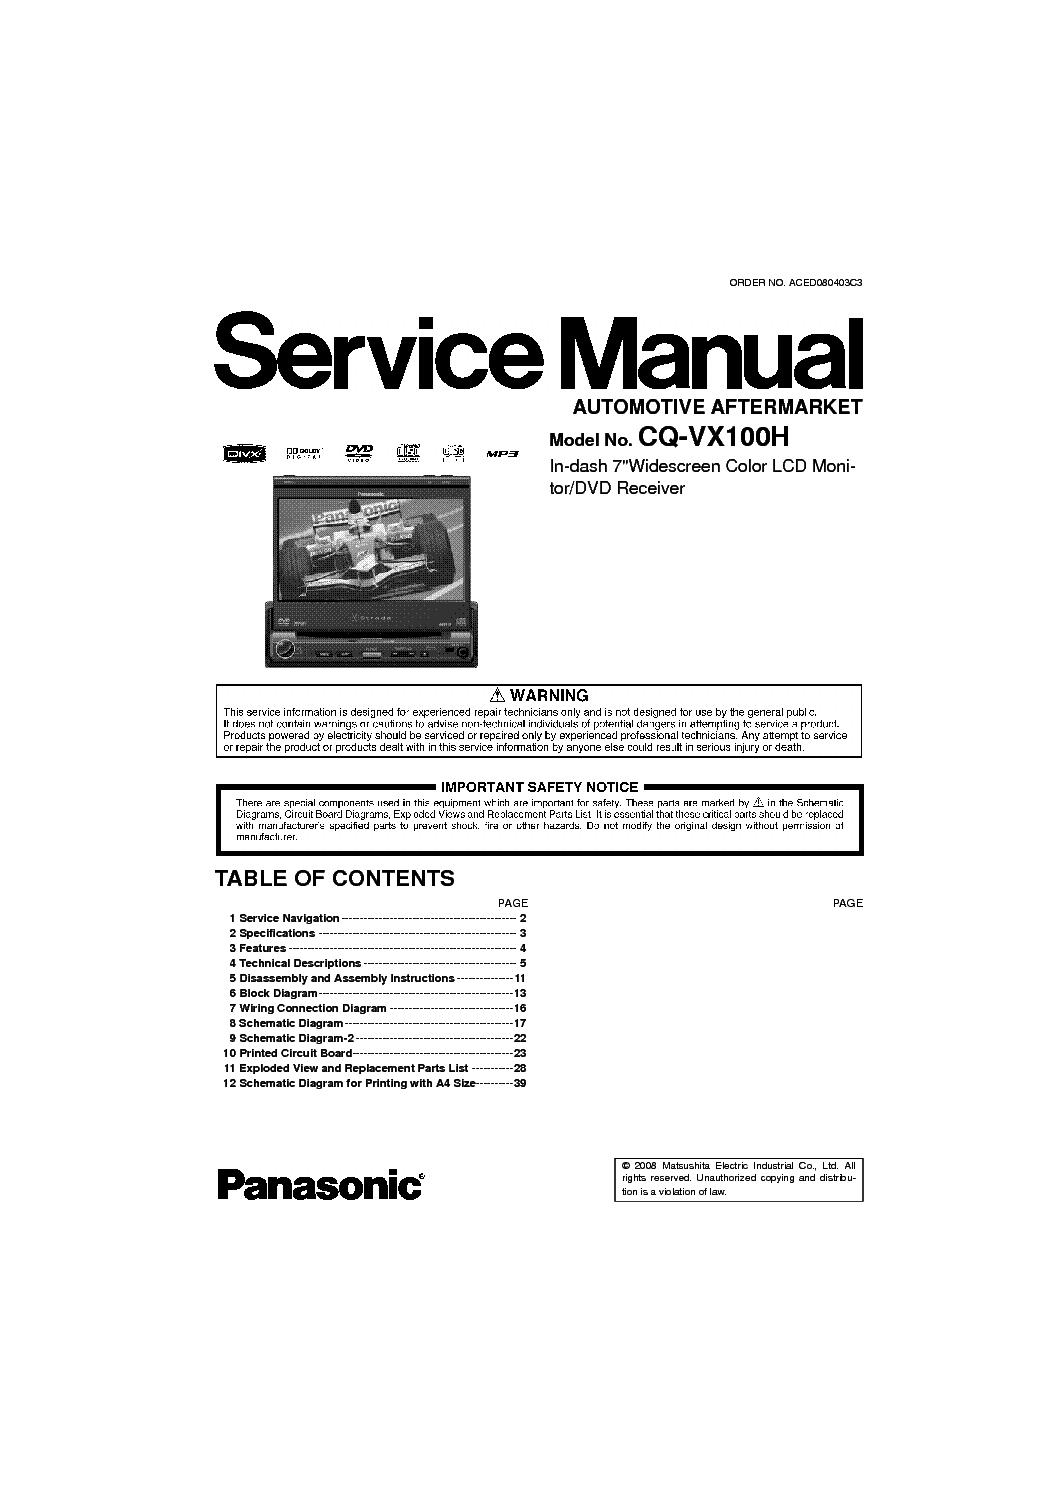 Panasonic Cq C7301u Wiring Diagram C7103u Trusted Harness C1101u Installation Vd6503u Wire